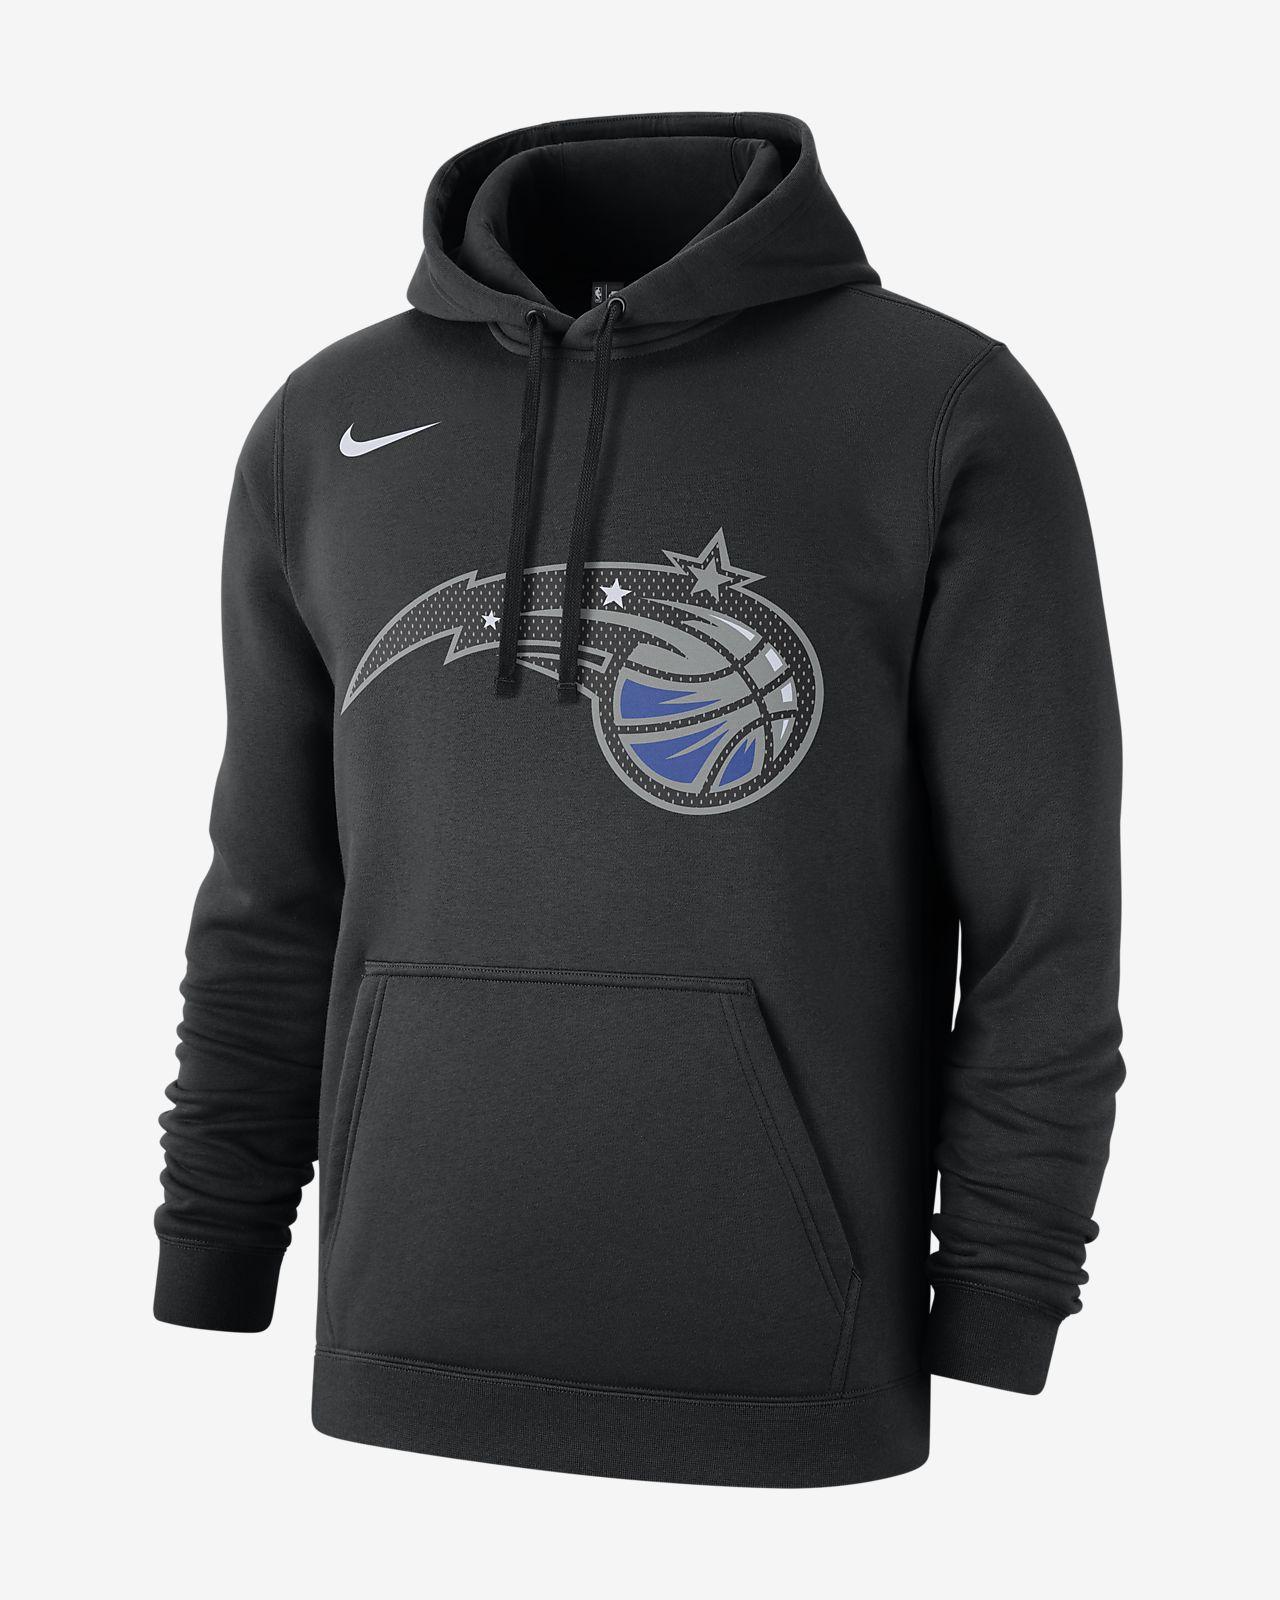 Orlando Magic Nike Men's NBA Hoodie